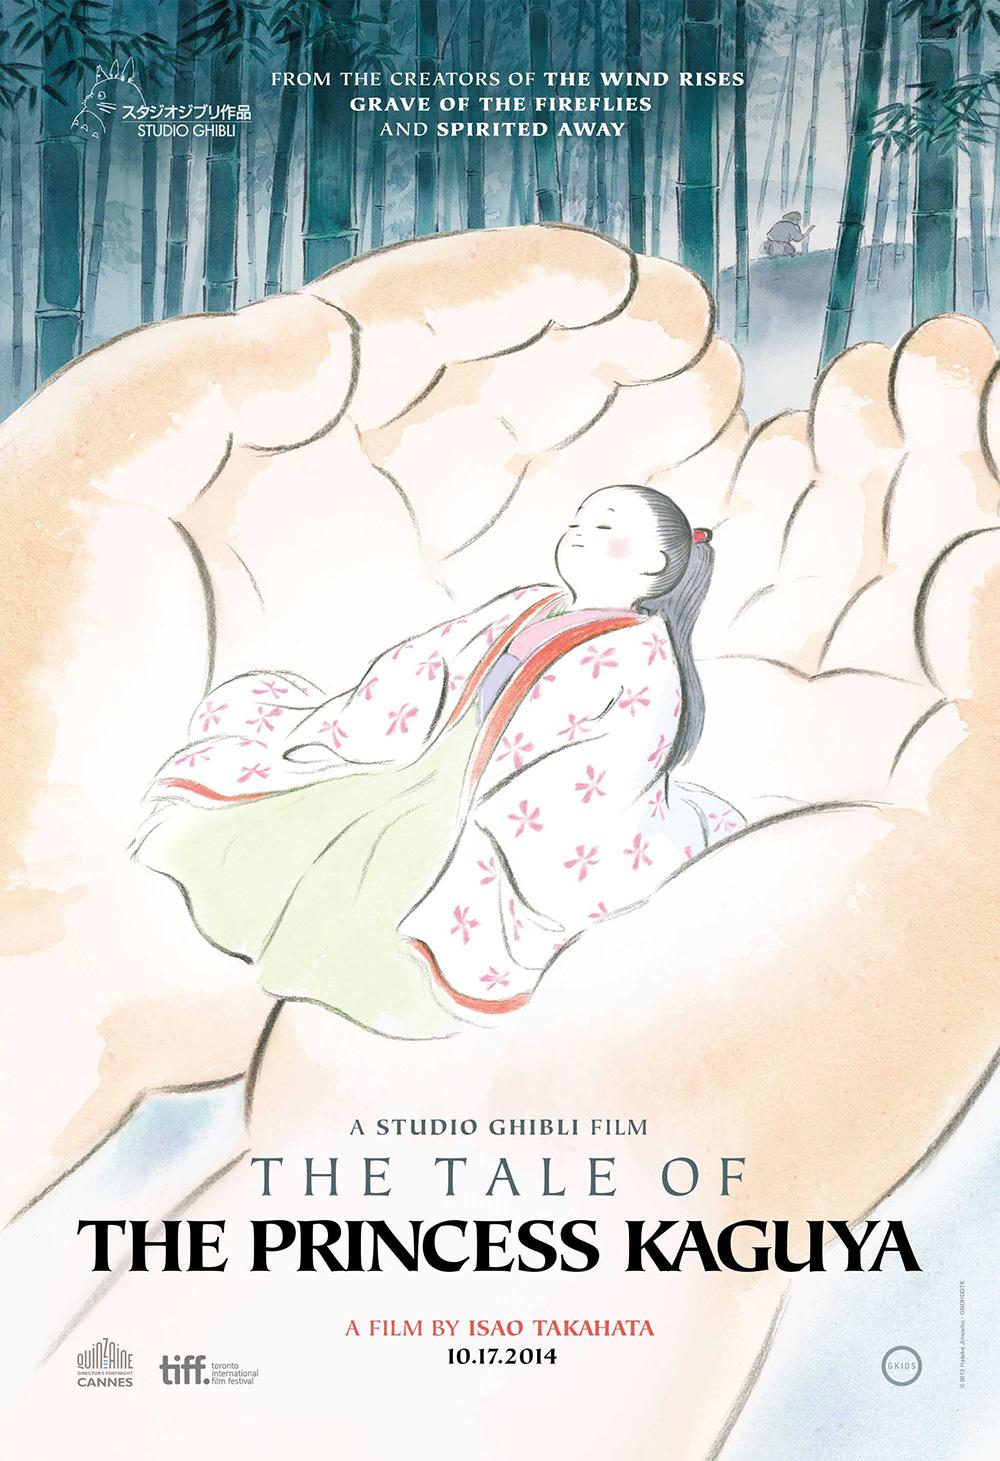 The-Tale-of-Princess-Kaguya_Haruhichan.com-Movie-Poster